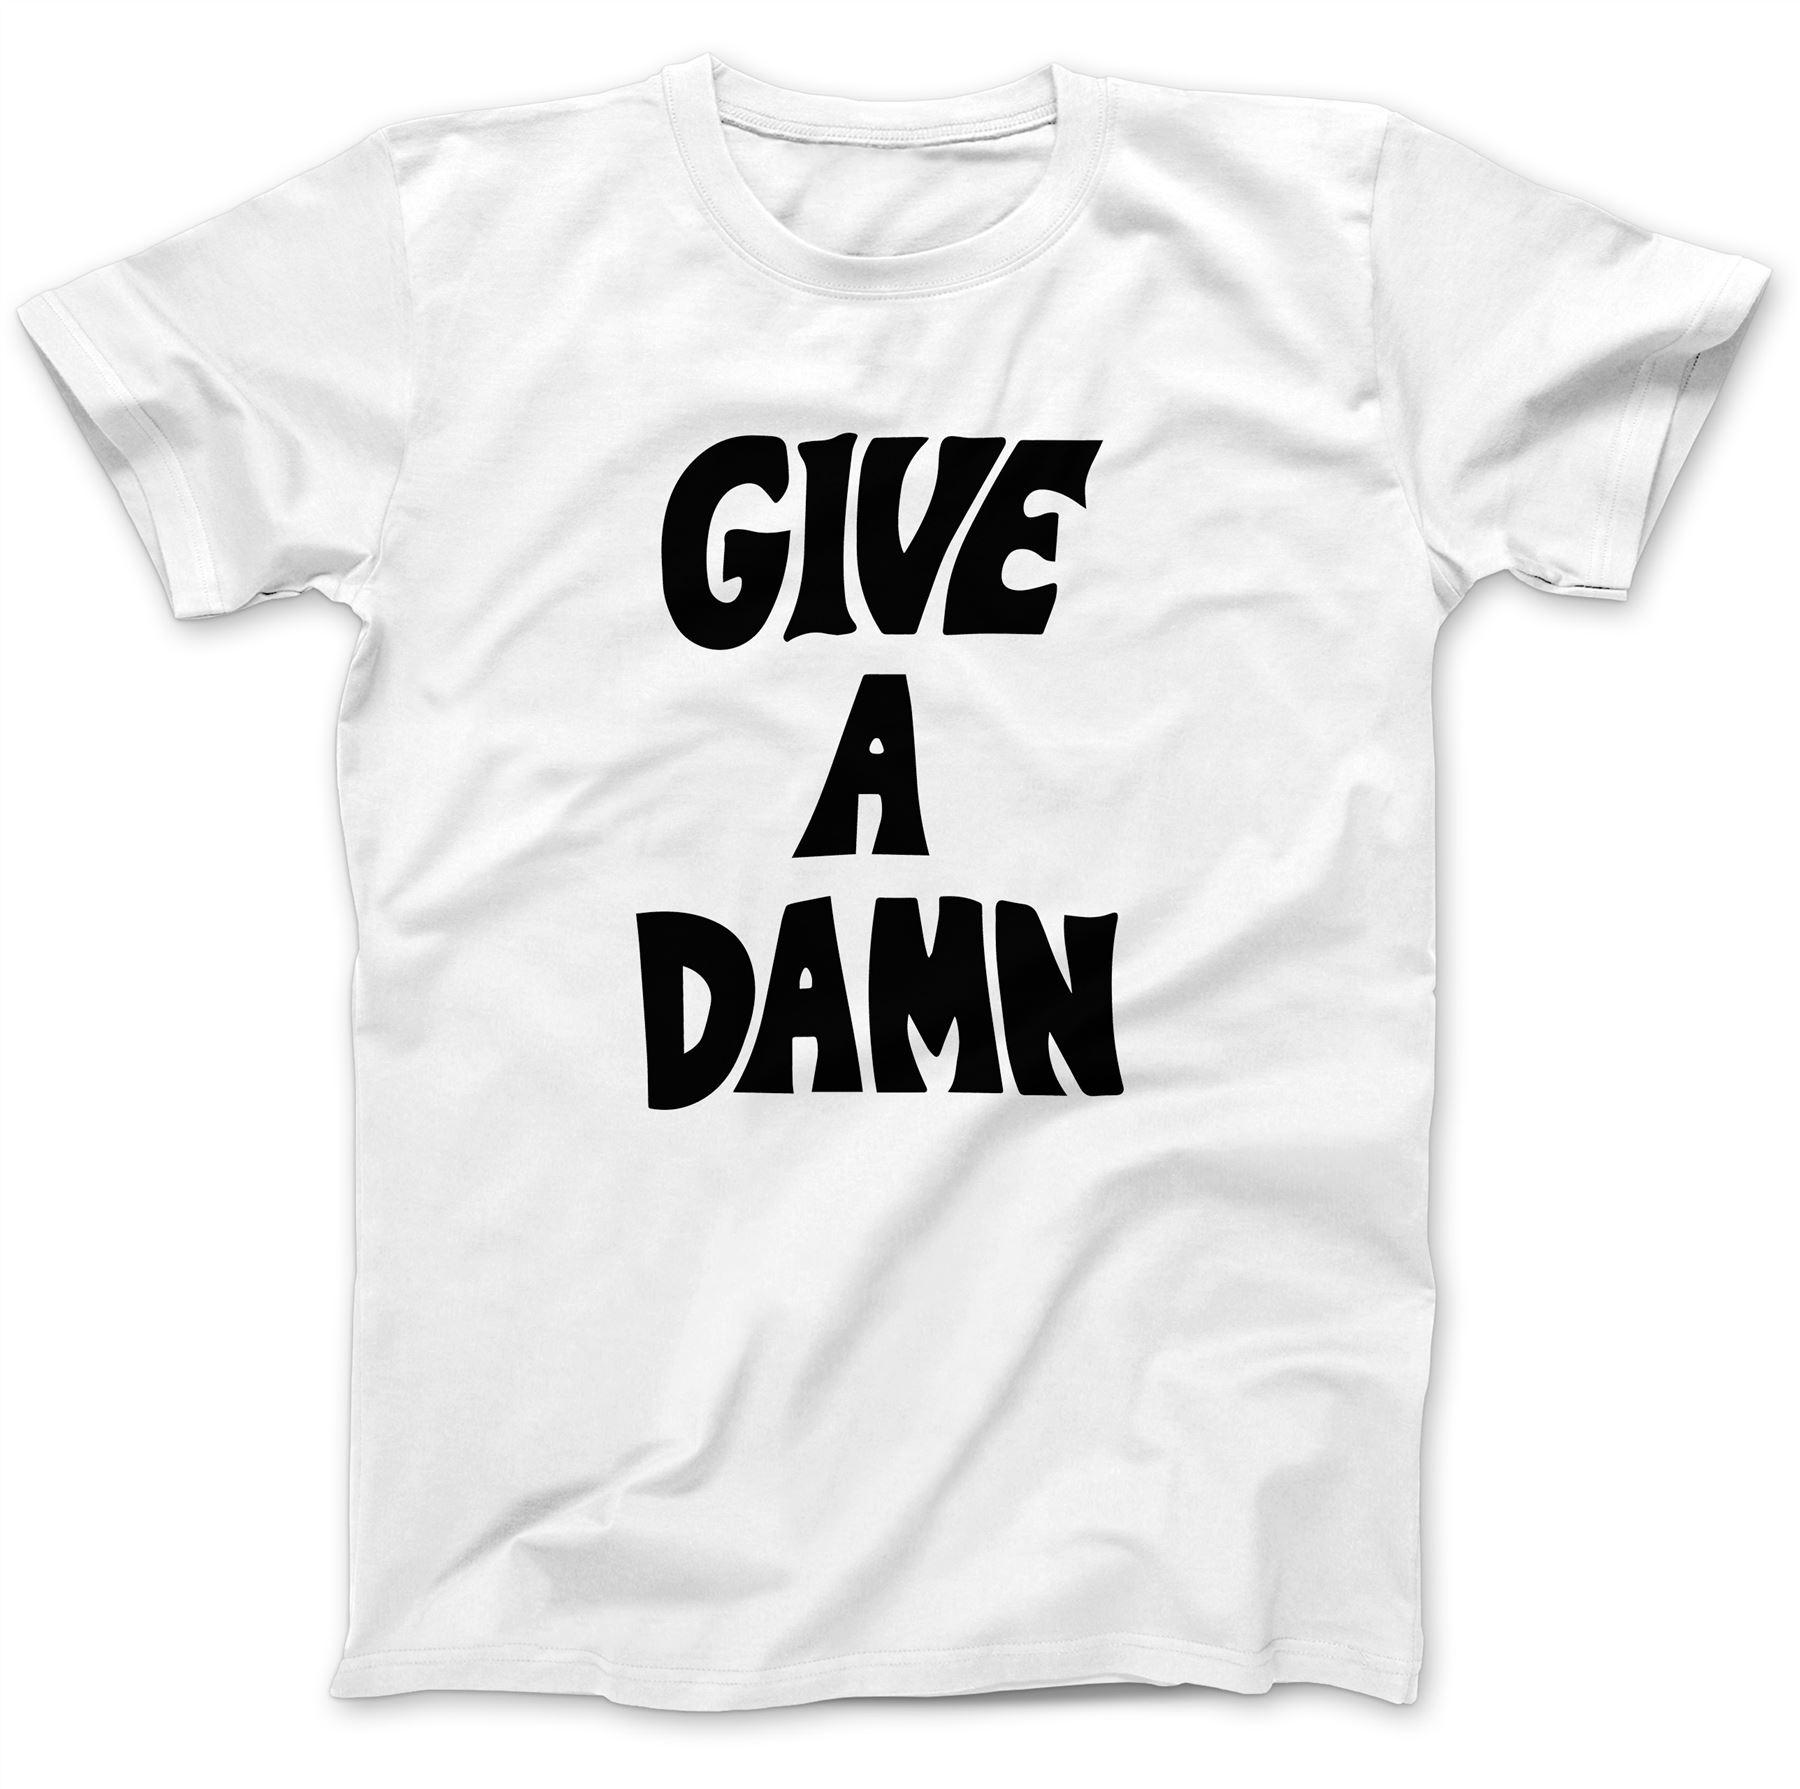 Give-A-Damn-As-Worn-By-Alex-Turner-T-Shirt-100-Premium-Cotton-Music-Gift miniatuur 12